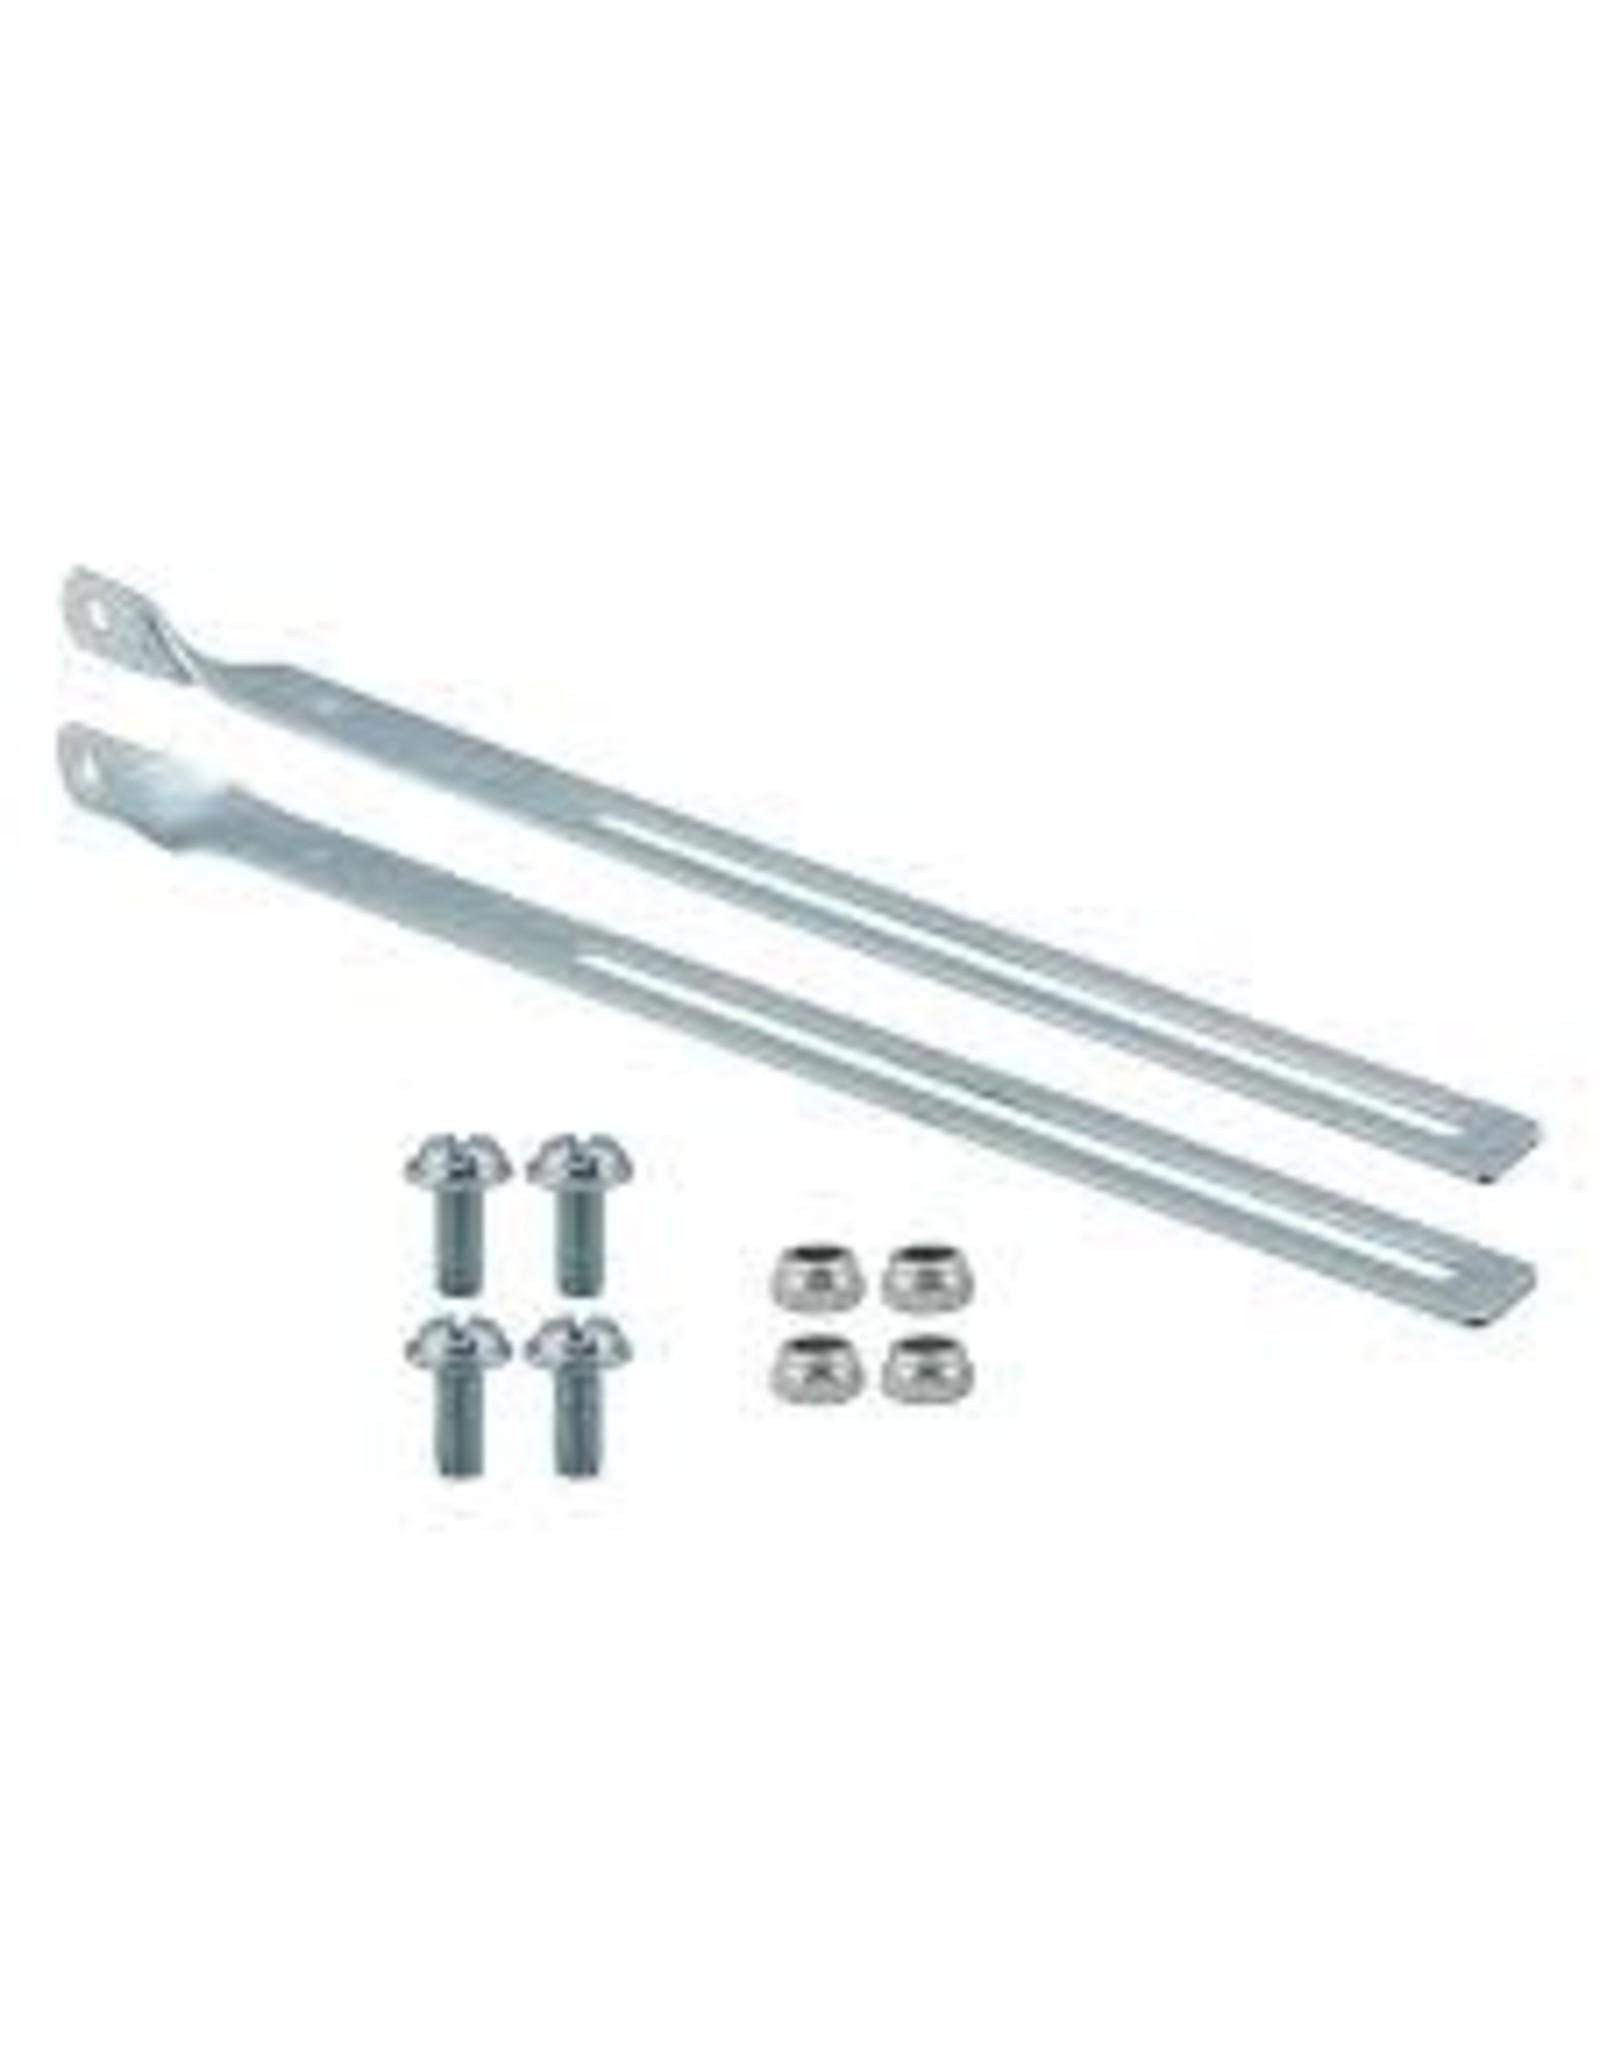 Rack Strut Kit 290mm W/Hdwr